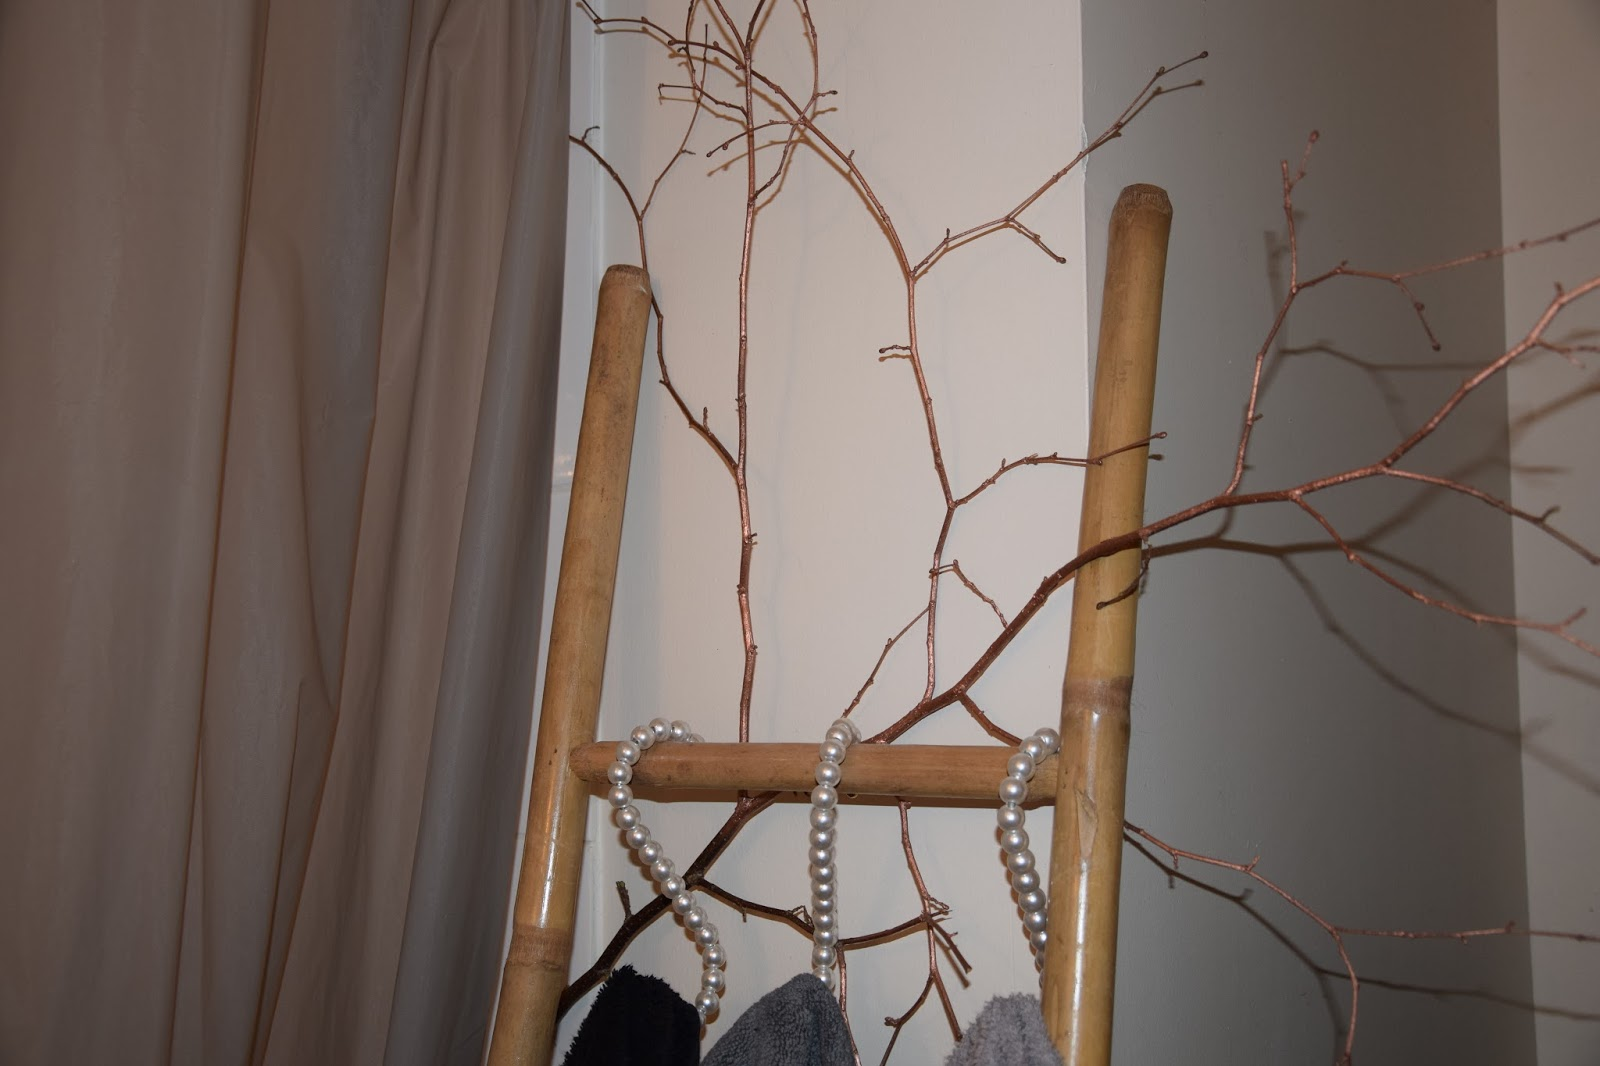 Lauriane blogueuse lifestyle clermont ferrand my home - Echelle decorative casa ...